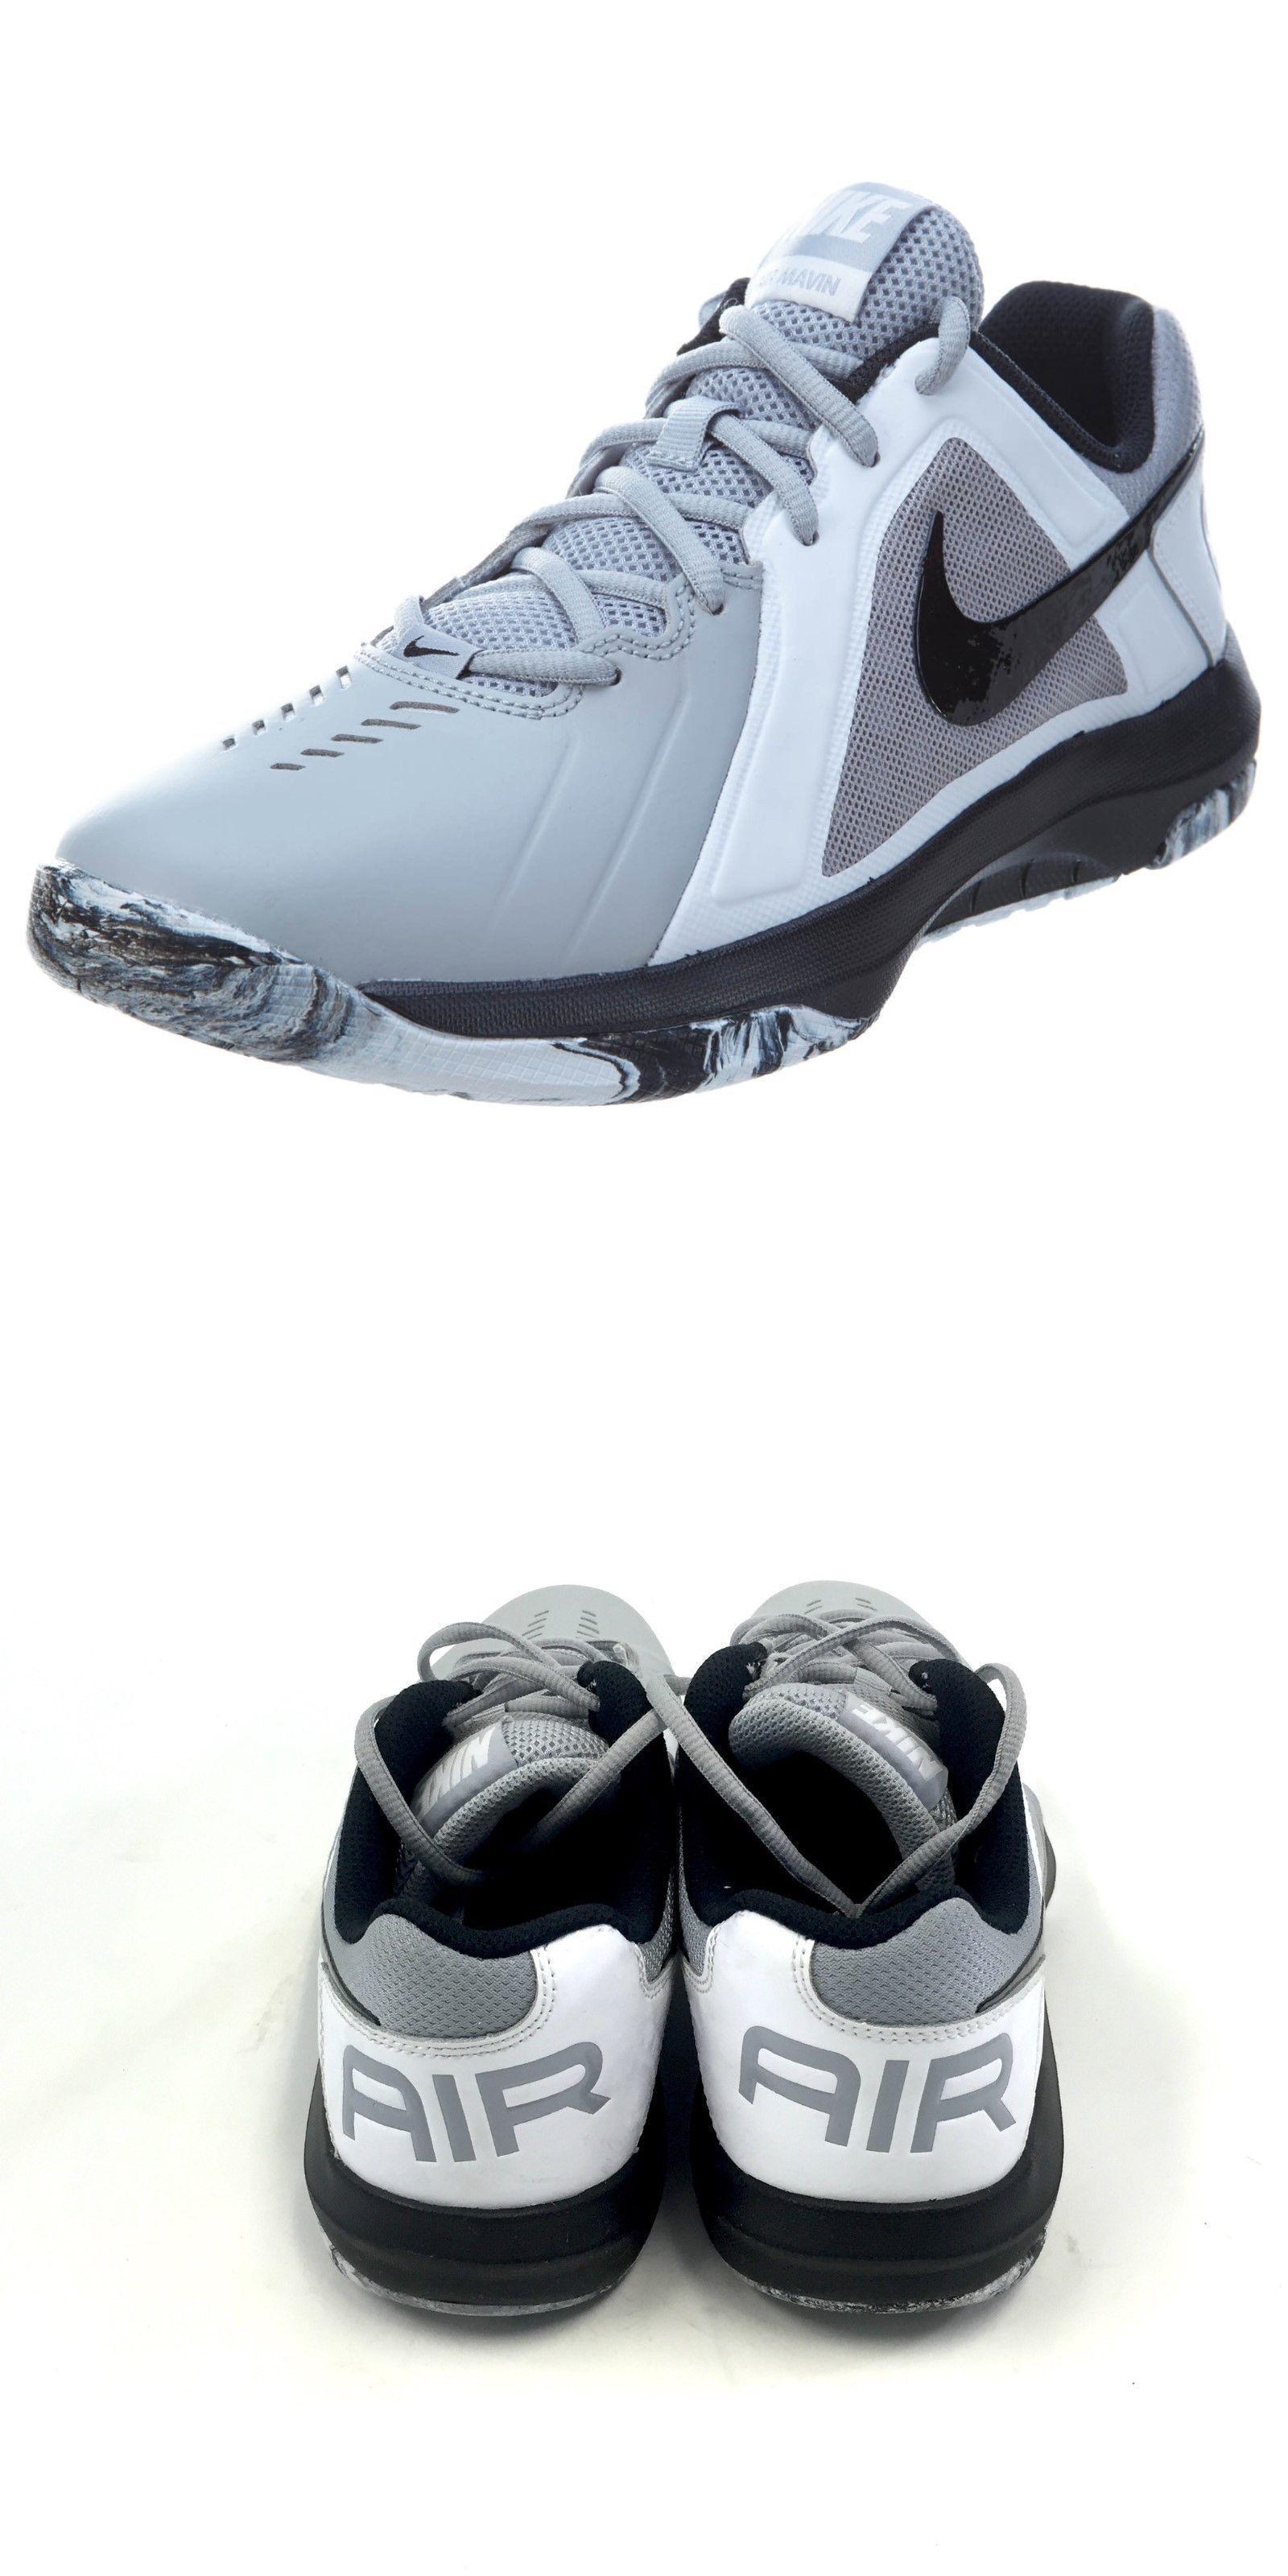 396ad8aefdab ... reduced men 158971 nike air mavin low mens basketball shoes gray 719924  005 size 14 new